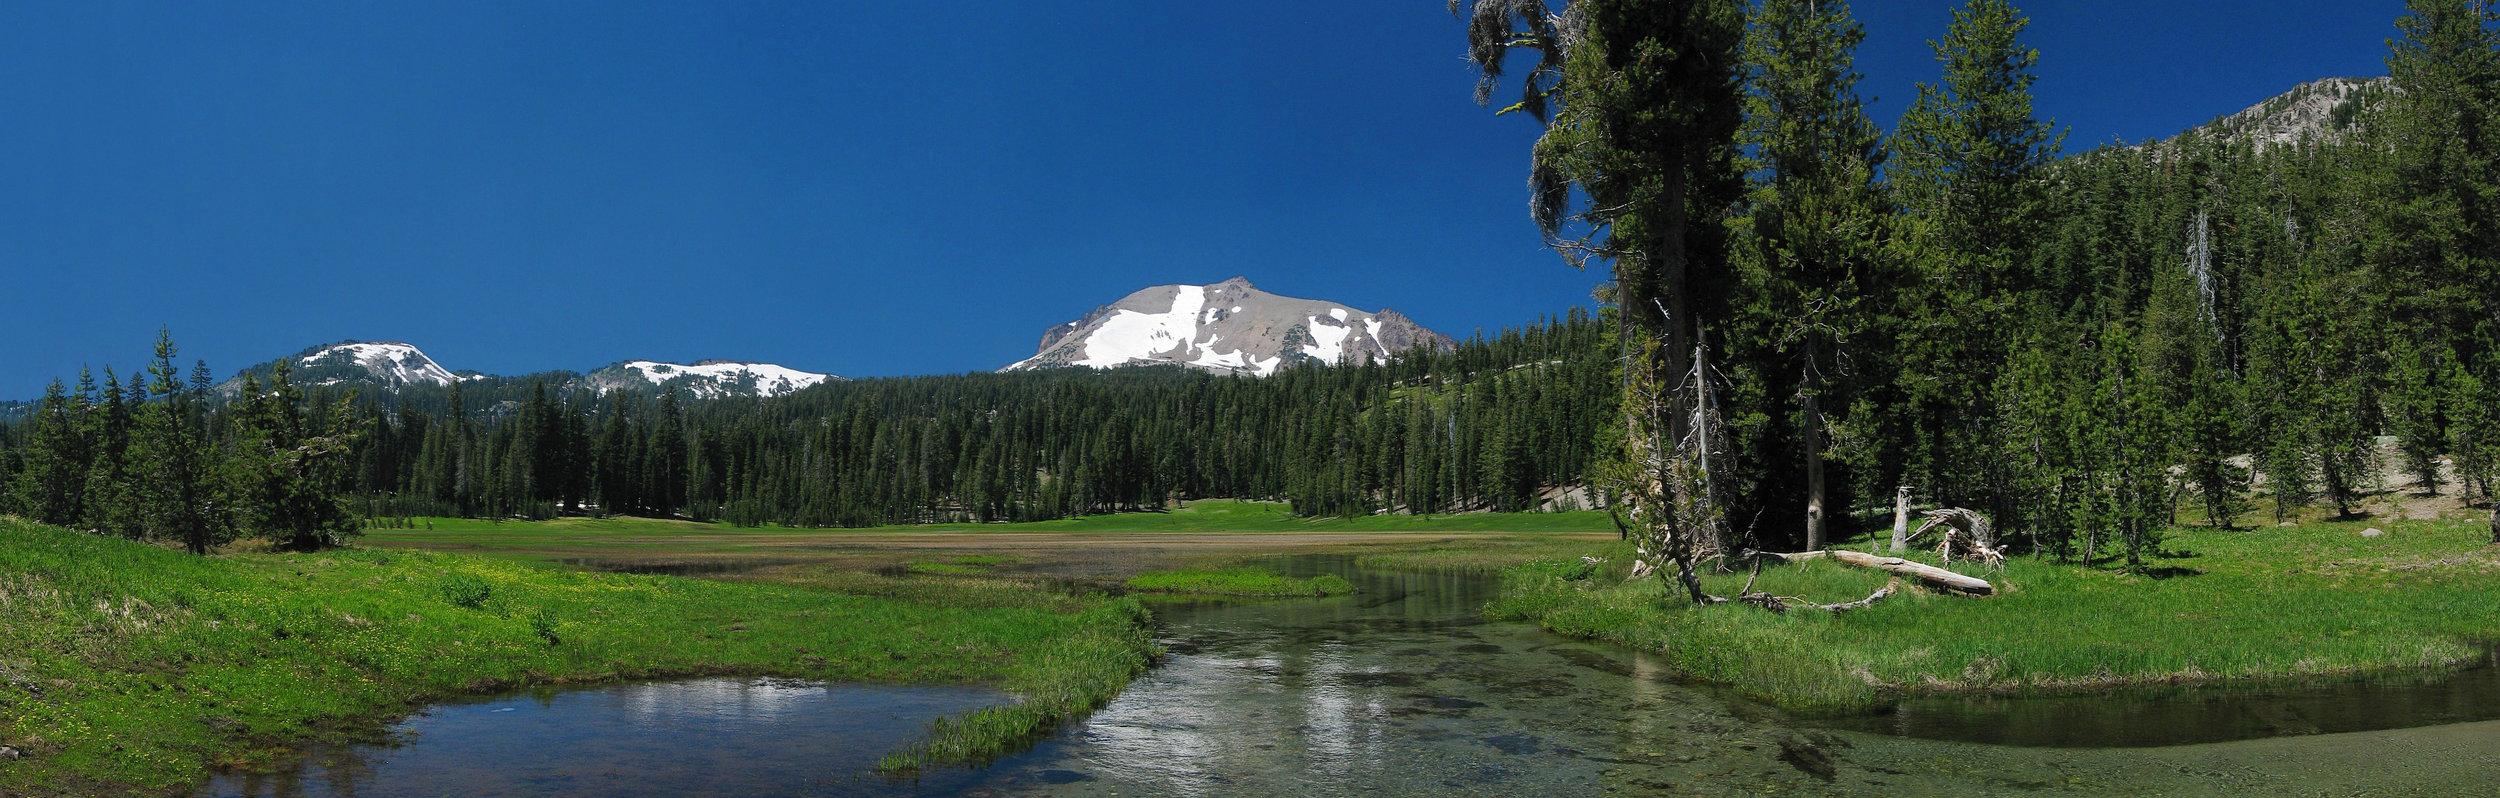 Kings Creek with Lassen Peak on the horizon